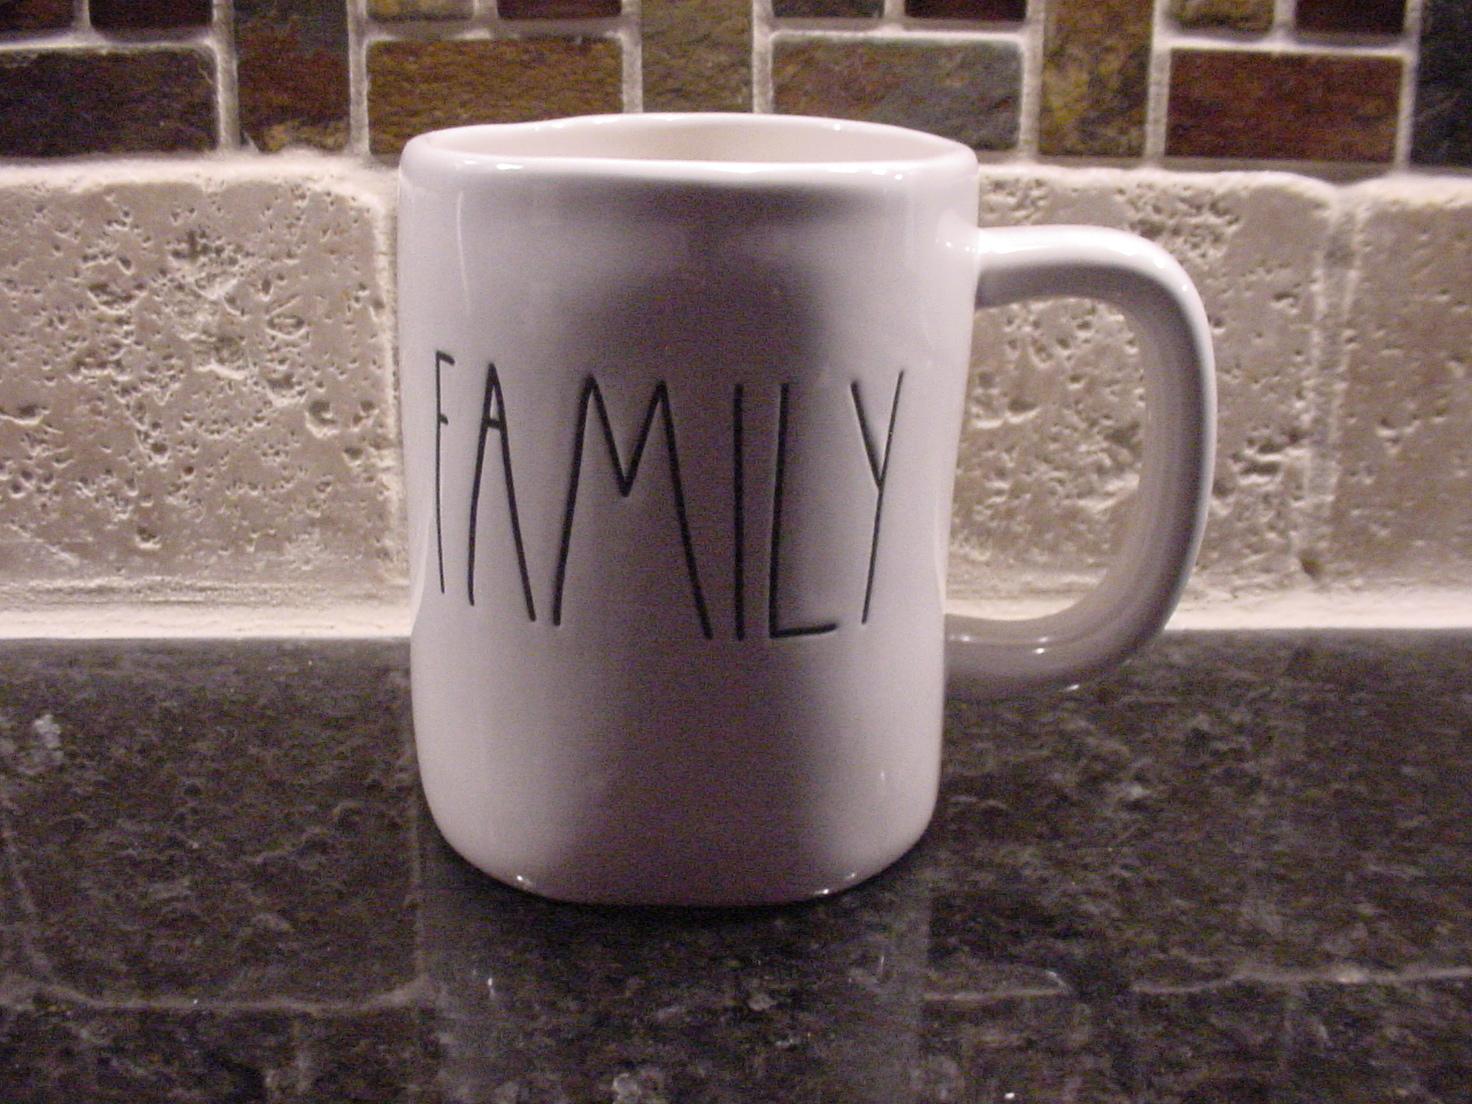 Rae Dunn FAMILY Mug, Ivory with Black Lettering